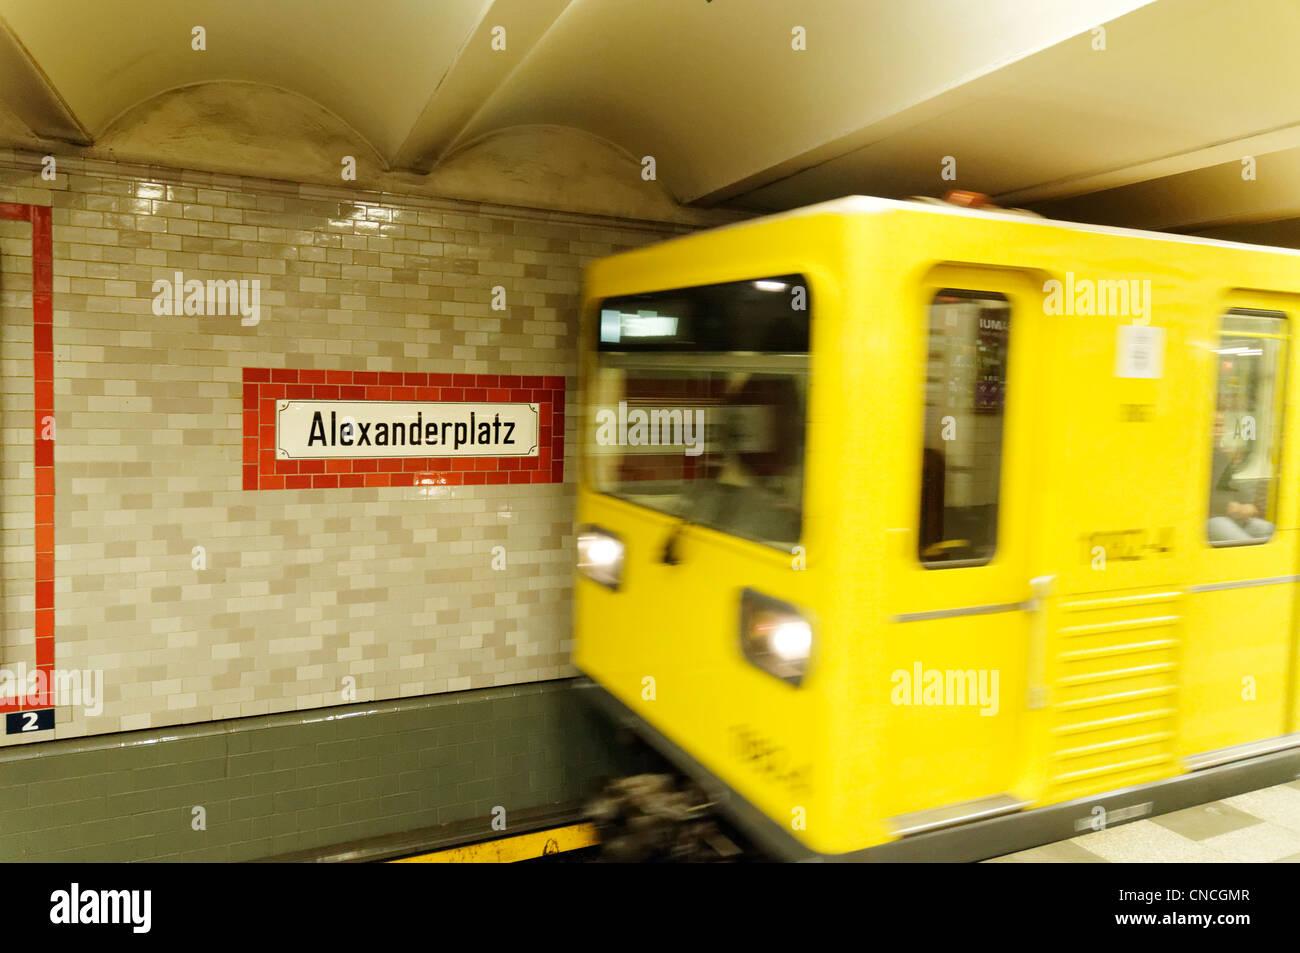 Ein u-Bahn-Zug Ankunft am Alexanderplatz, Berlin Stockbild